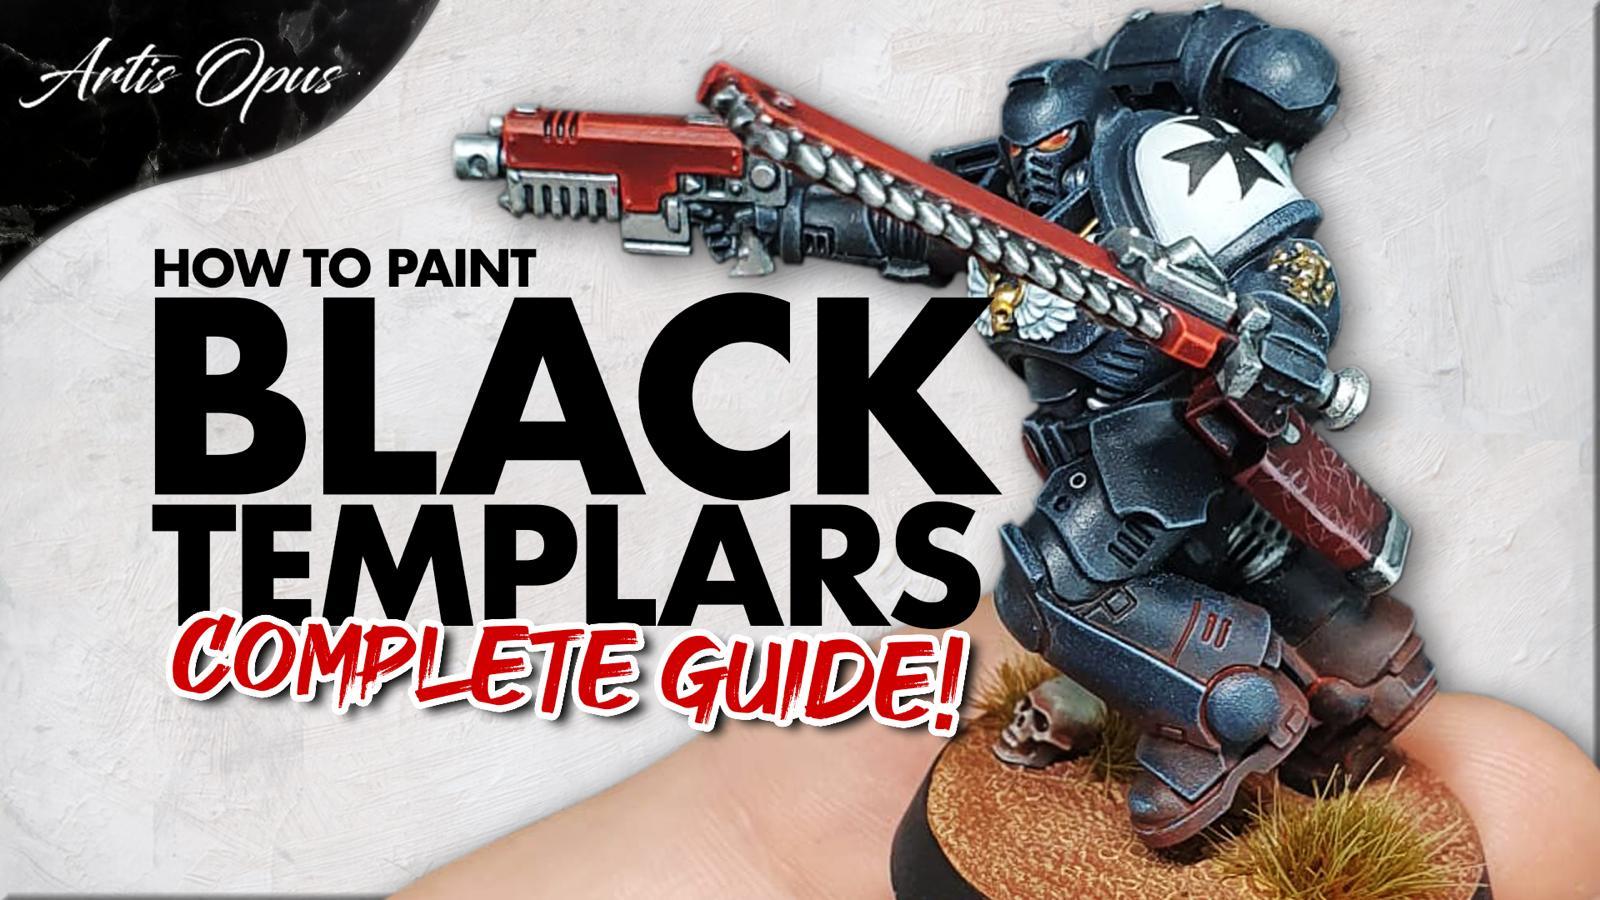 Artis Opus Black Templar Painting Tutorial Bundle